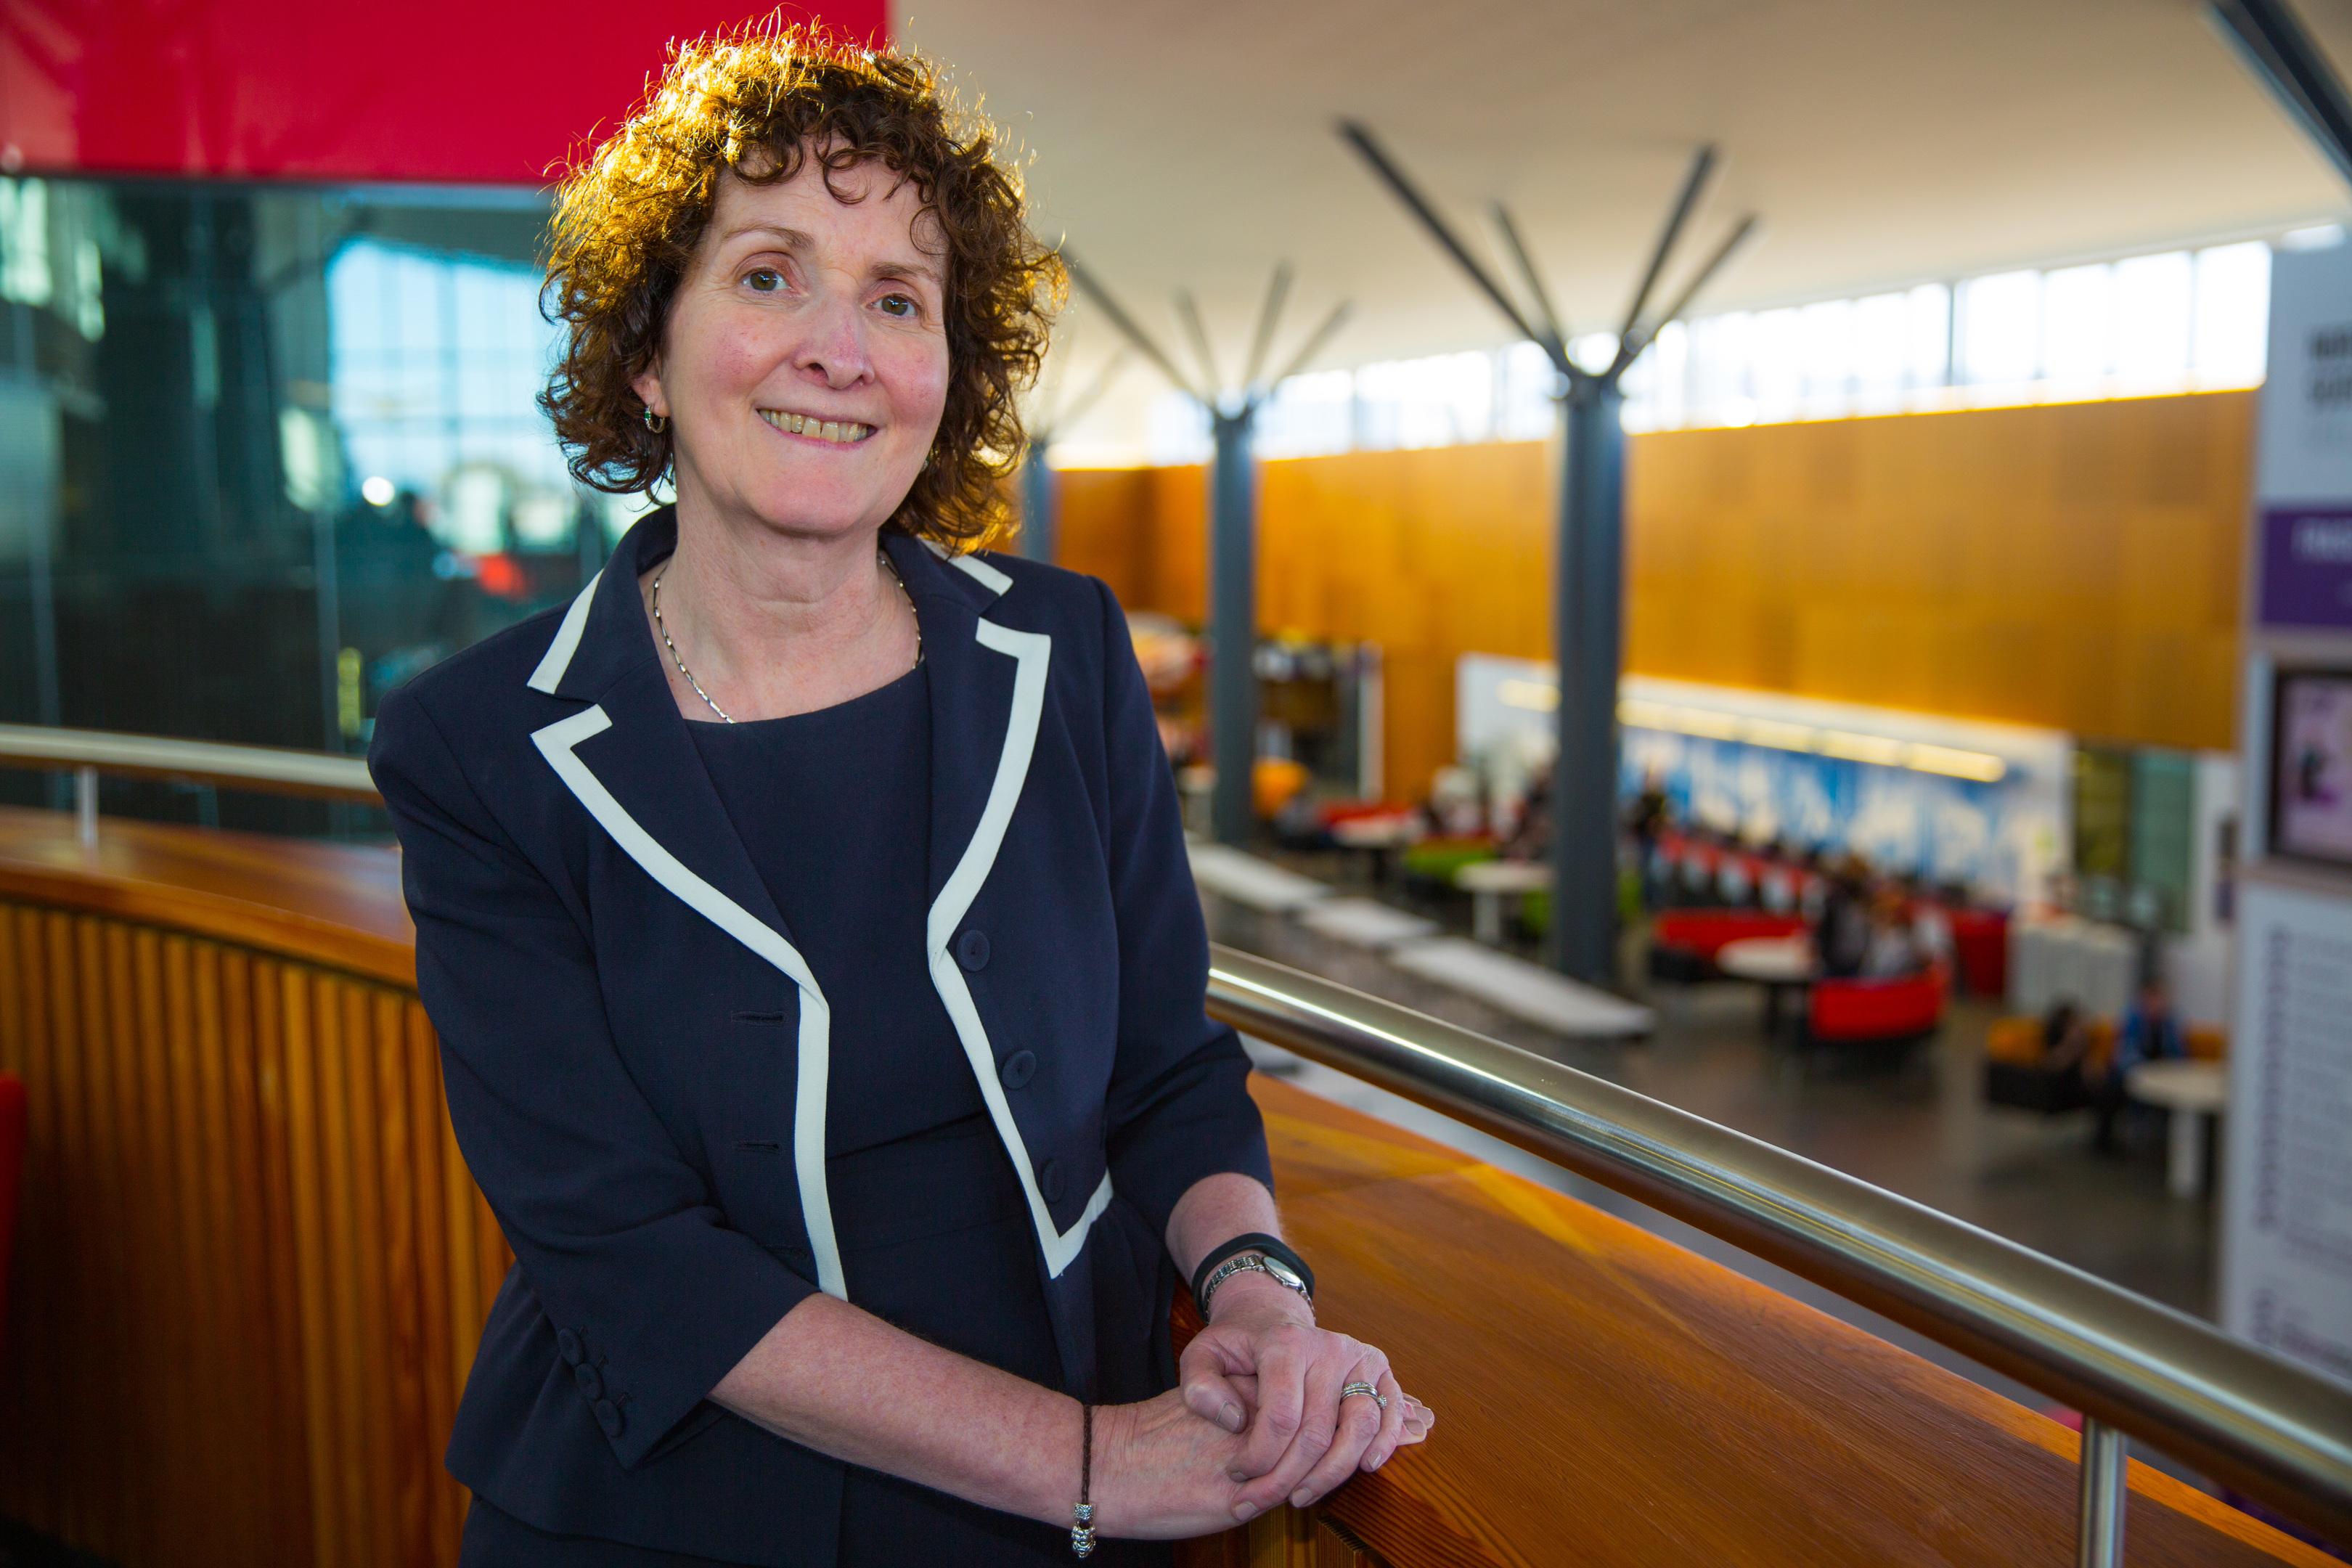 Nescol principal Liz McIntyre in Fraserburgh